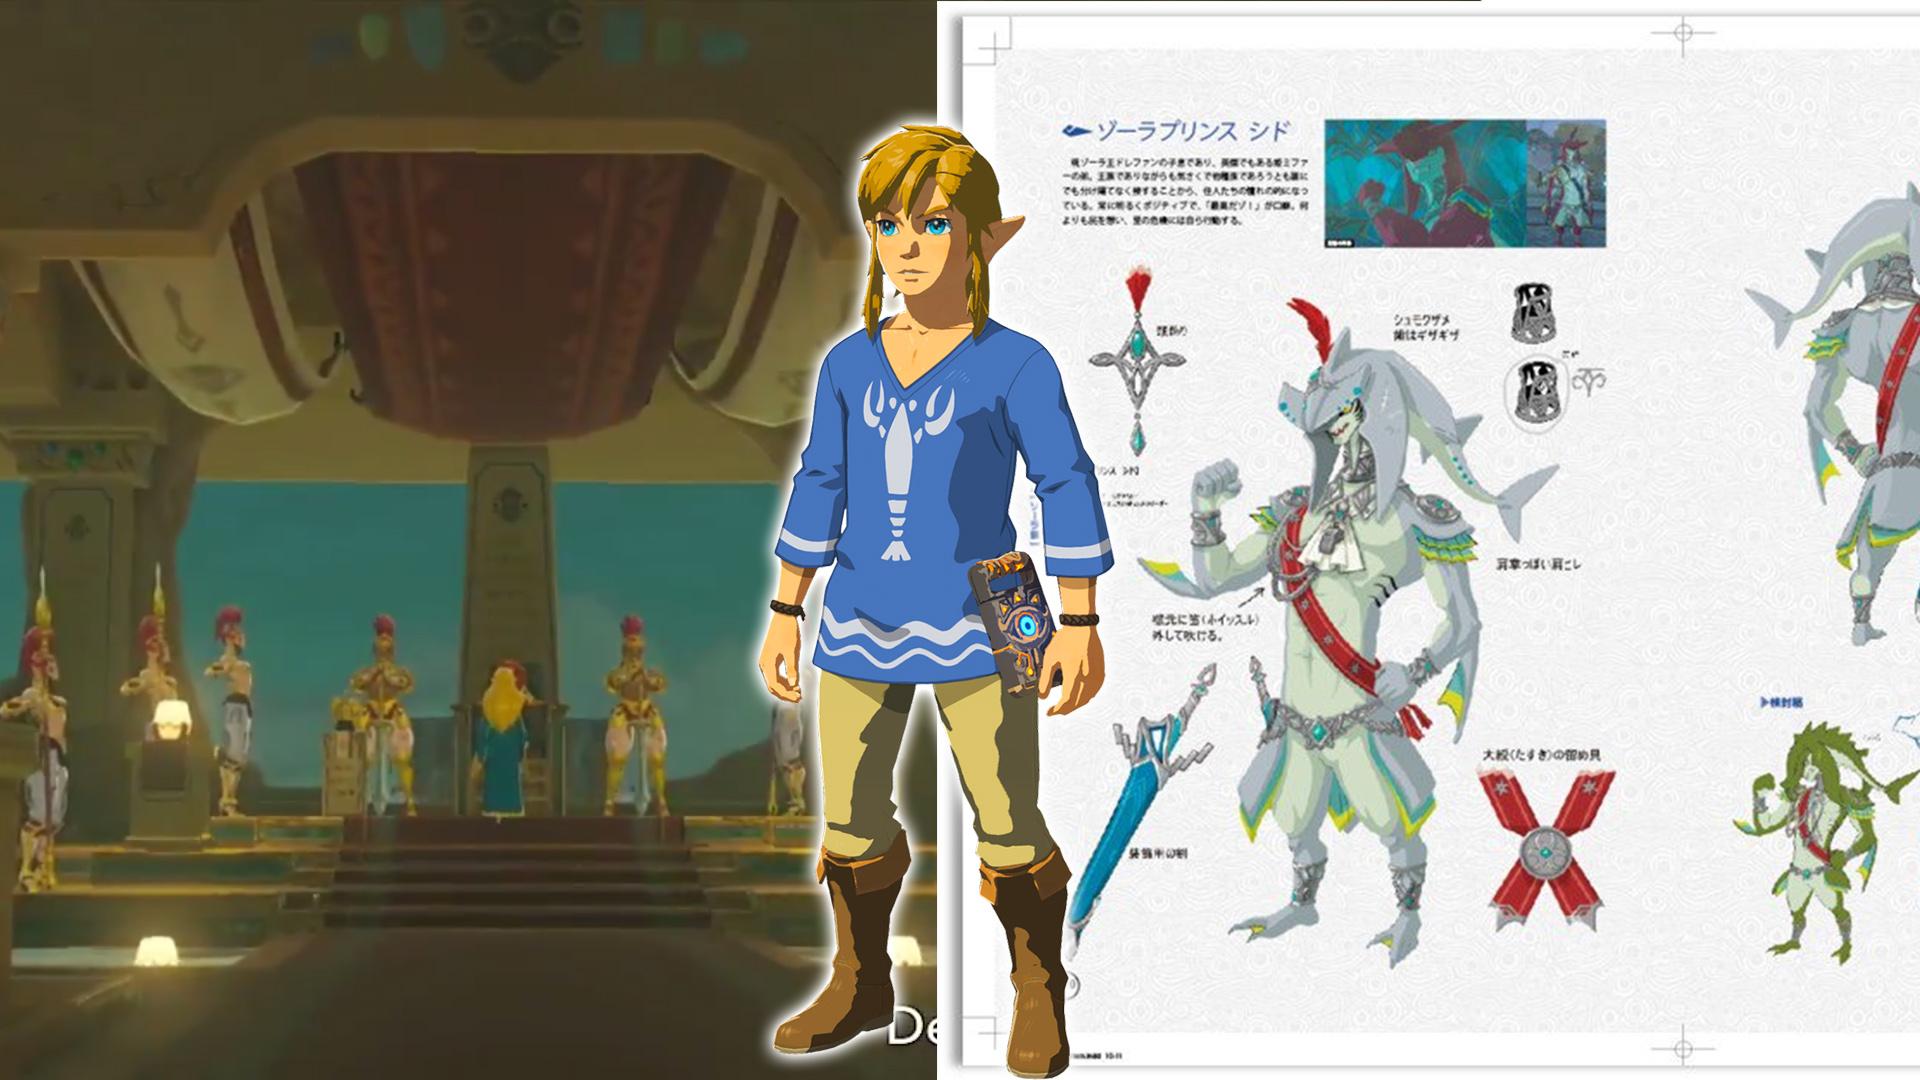 Summer Animal Wallpaper More Champions Ballad Dlc Info Released Third Zelda